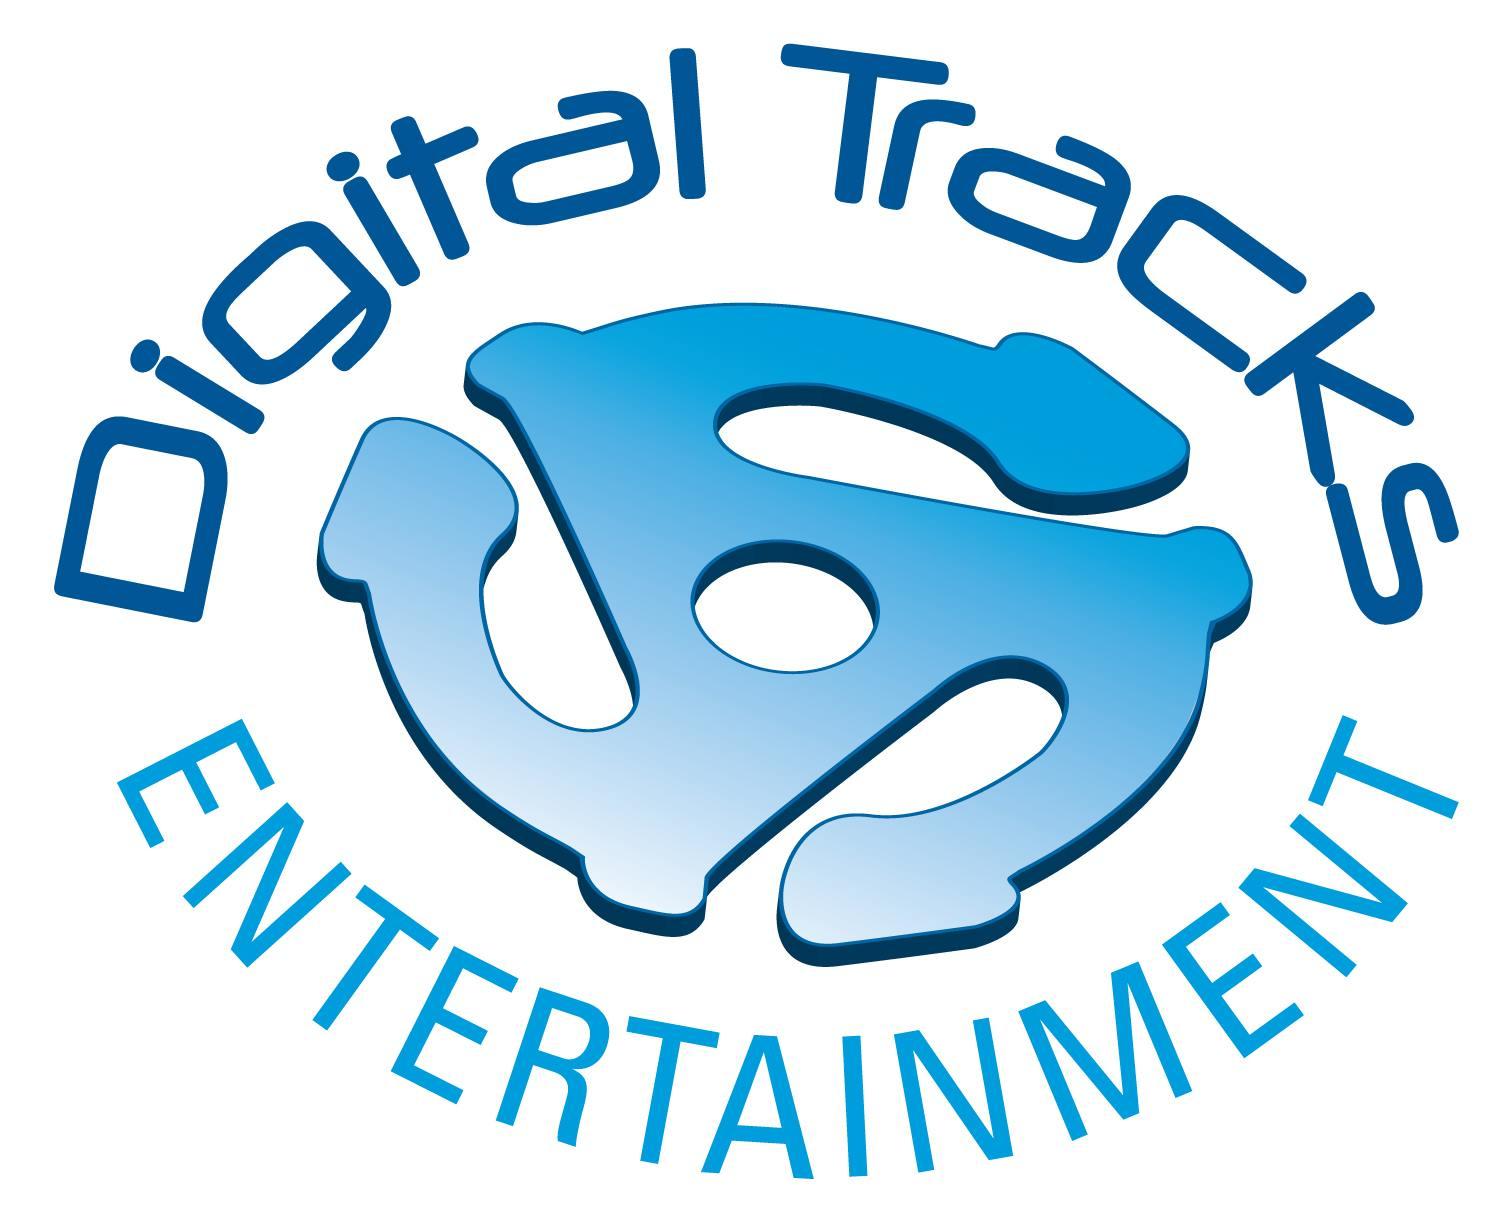 Digital Tracks Entertainment - www.digitaltracksdj.comdigitaltracksdj@yahoo.com